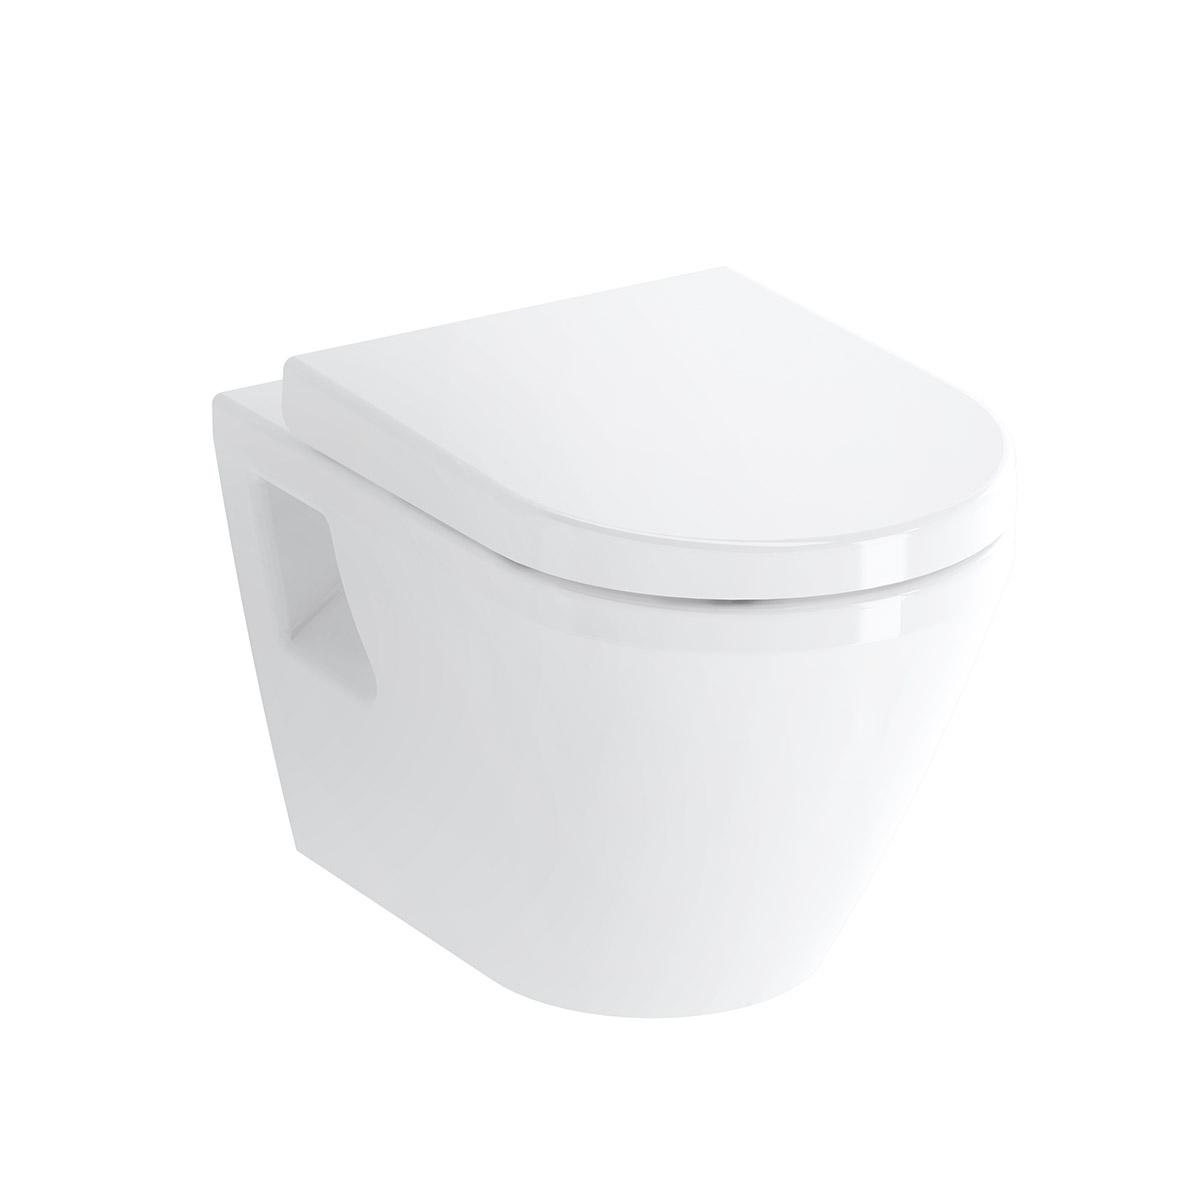 Integra Wand-WC mit Bidetfunktion, Tiefspüler